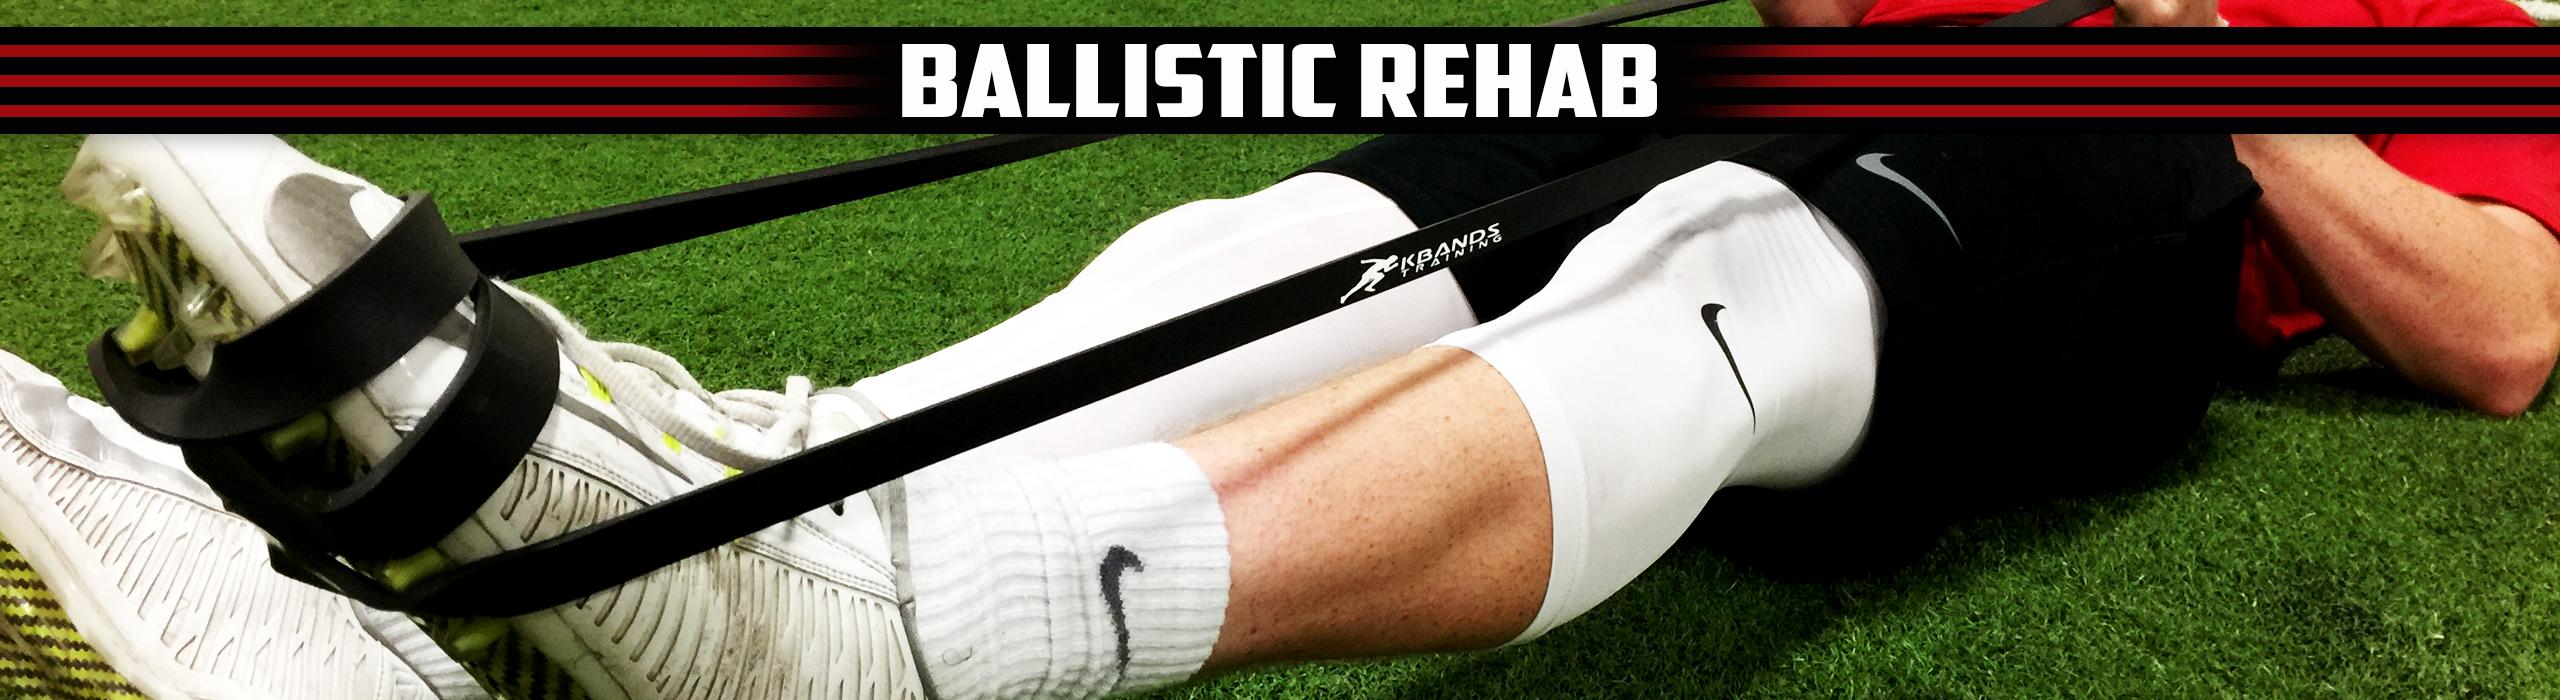 Ballistic Rehab